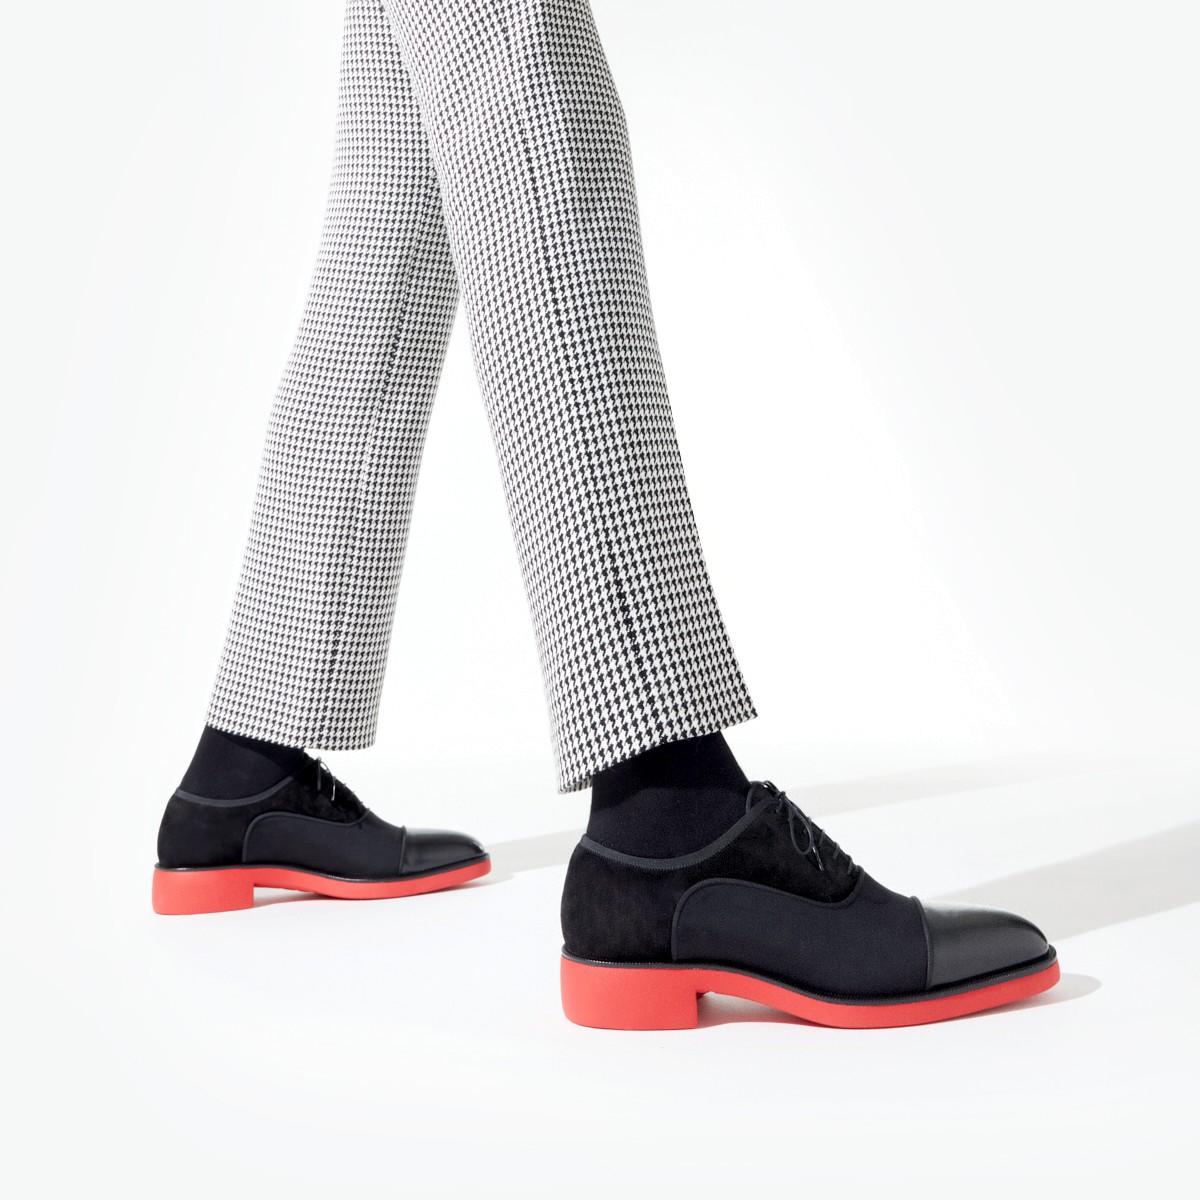 鞋履 - Greggo Rxl - Christian Louboutin